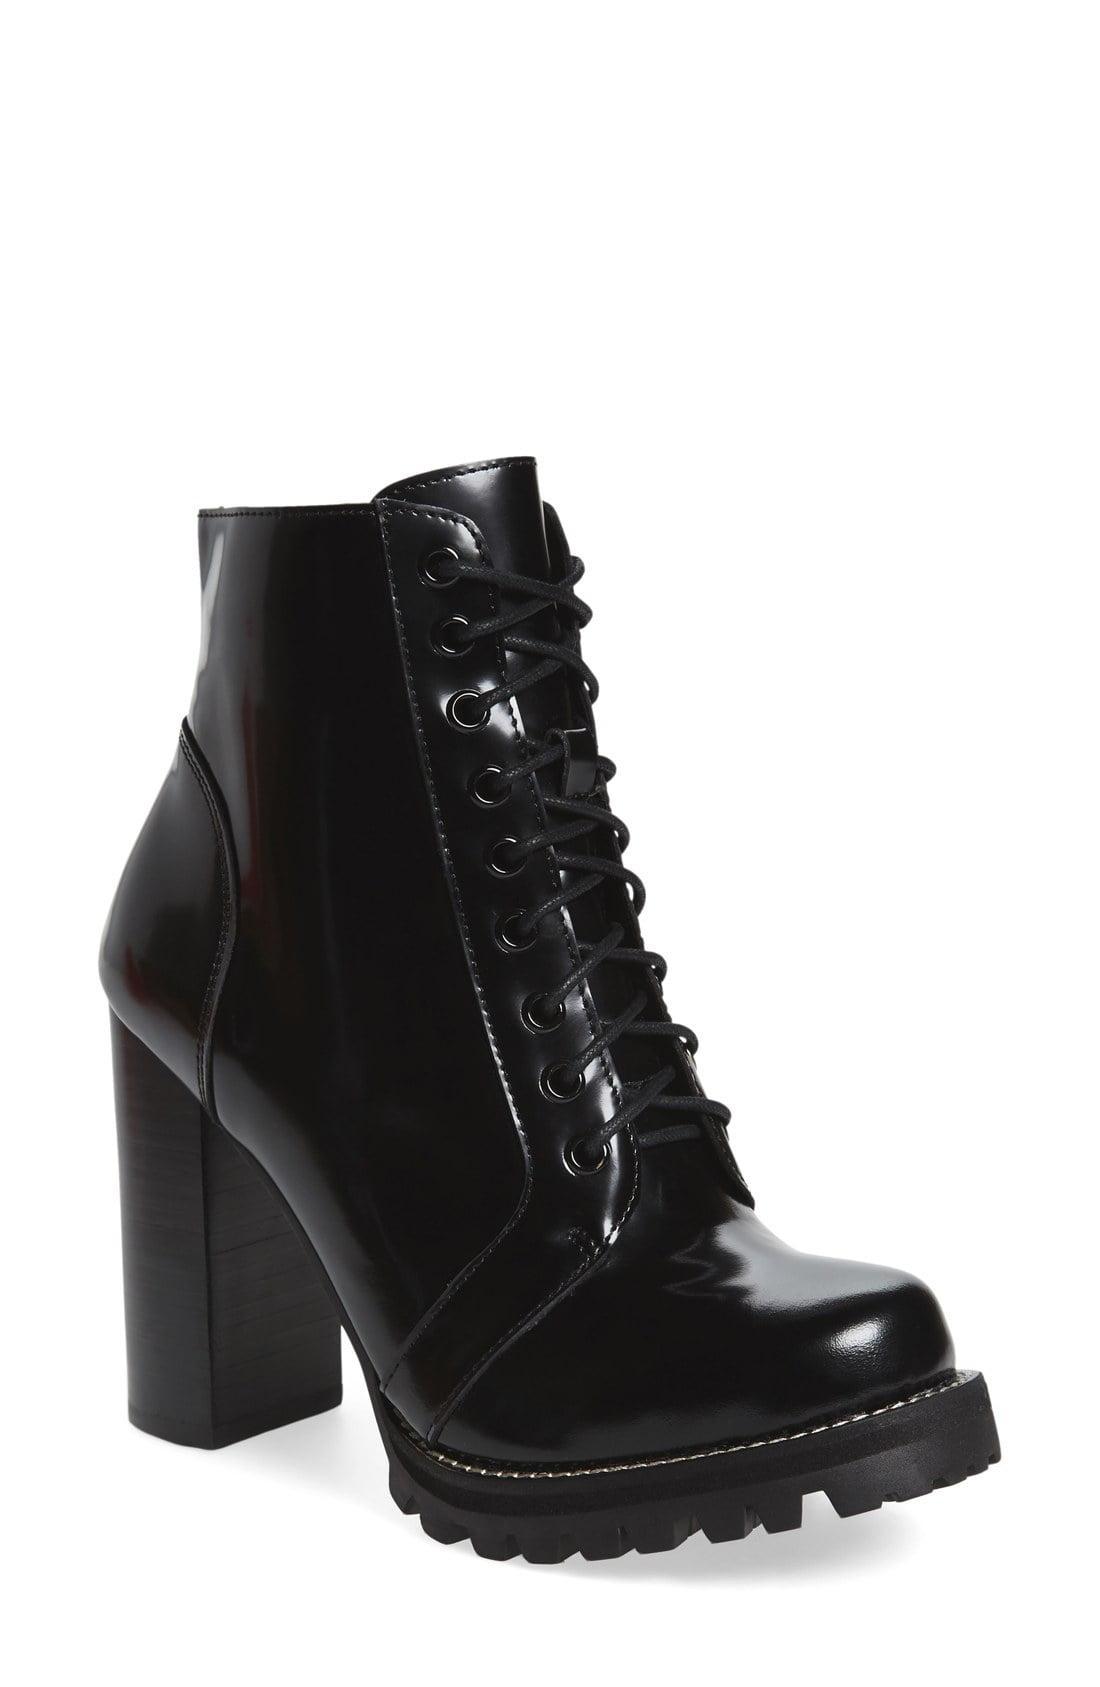 c2a9c3b3038 Lyst - Jeffrey Campbell Legion High-heel Boots in Black